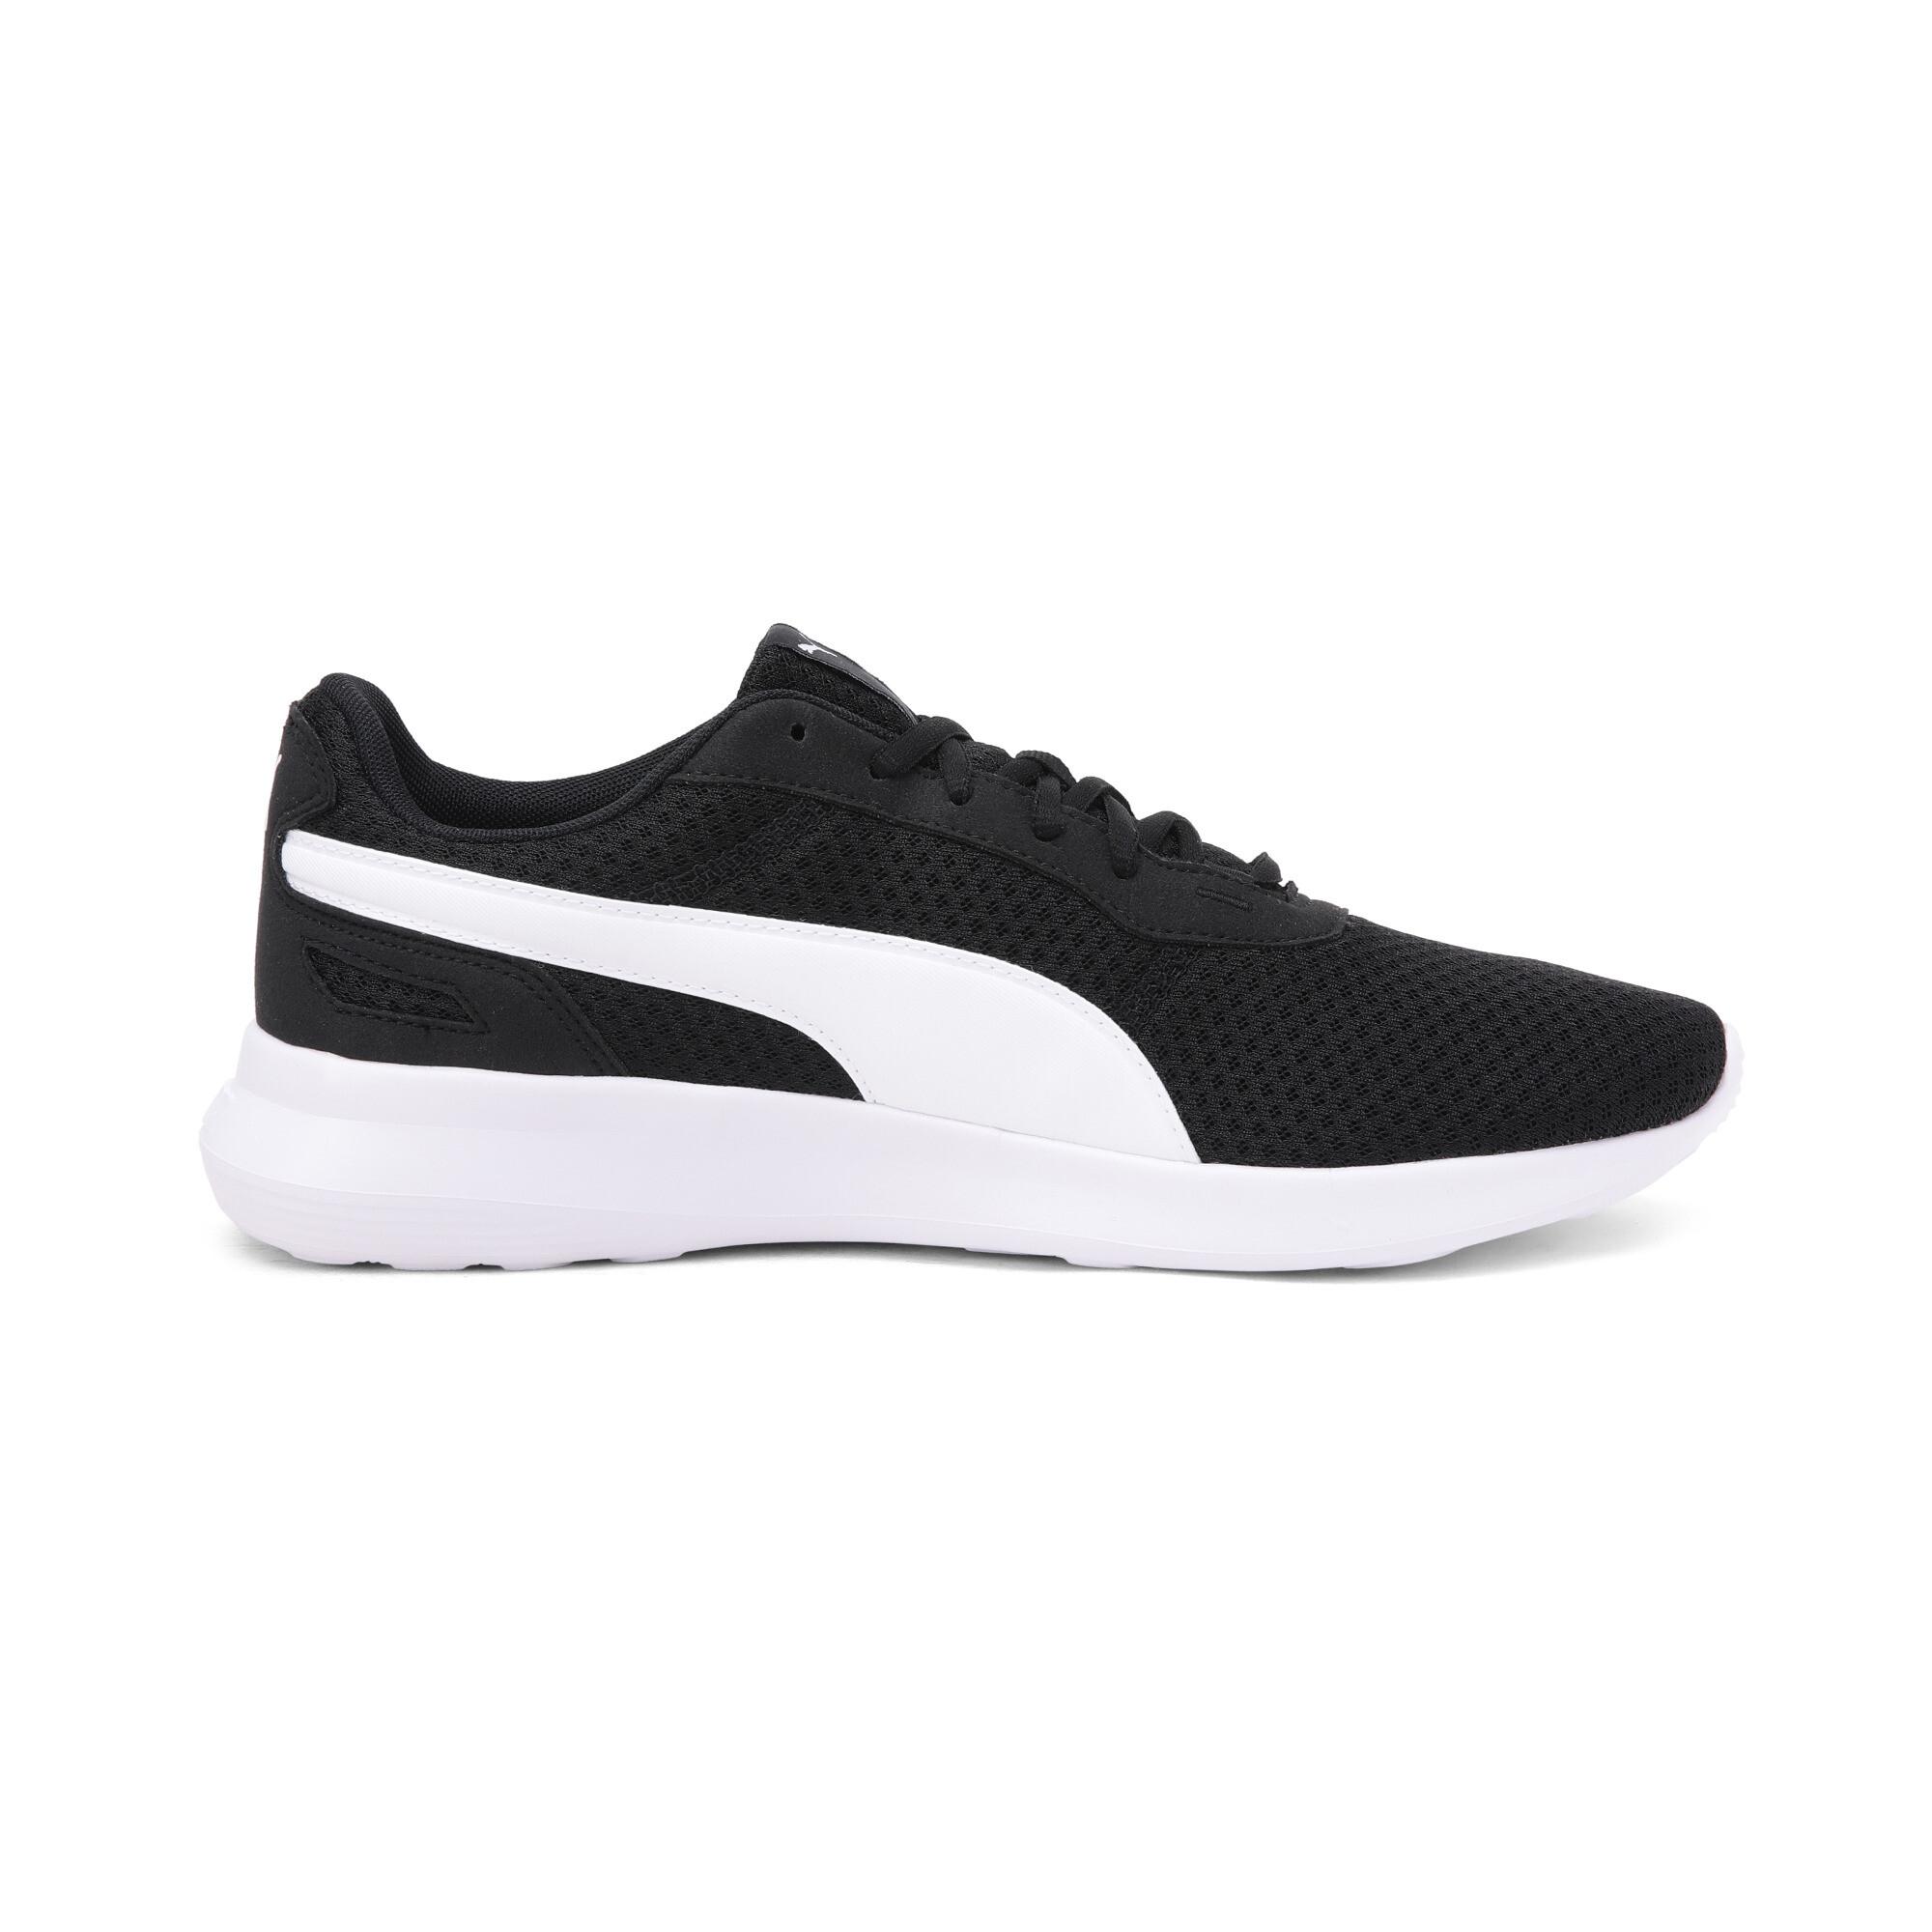 PUMA-Men-039-s-ST-Activate-Sneakers thumbnail 11